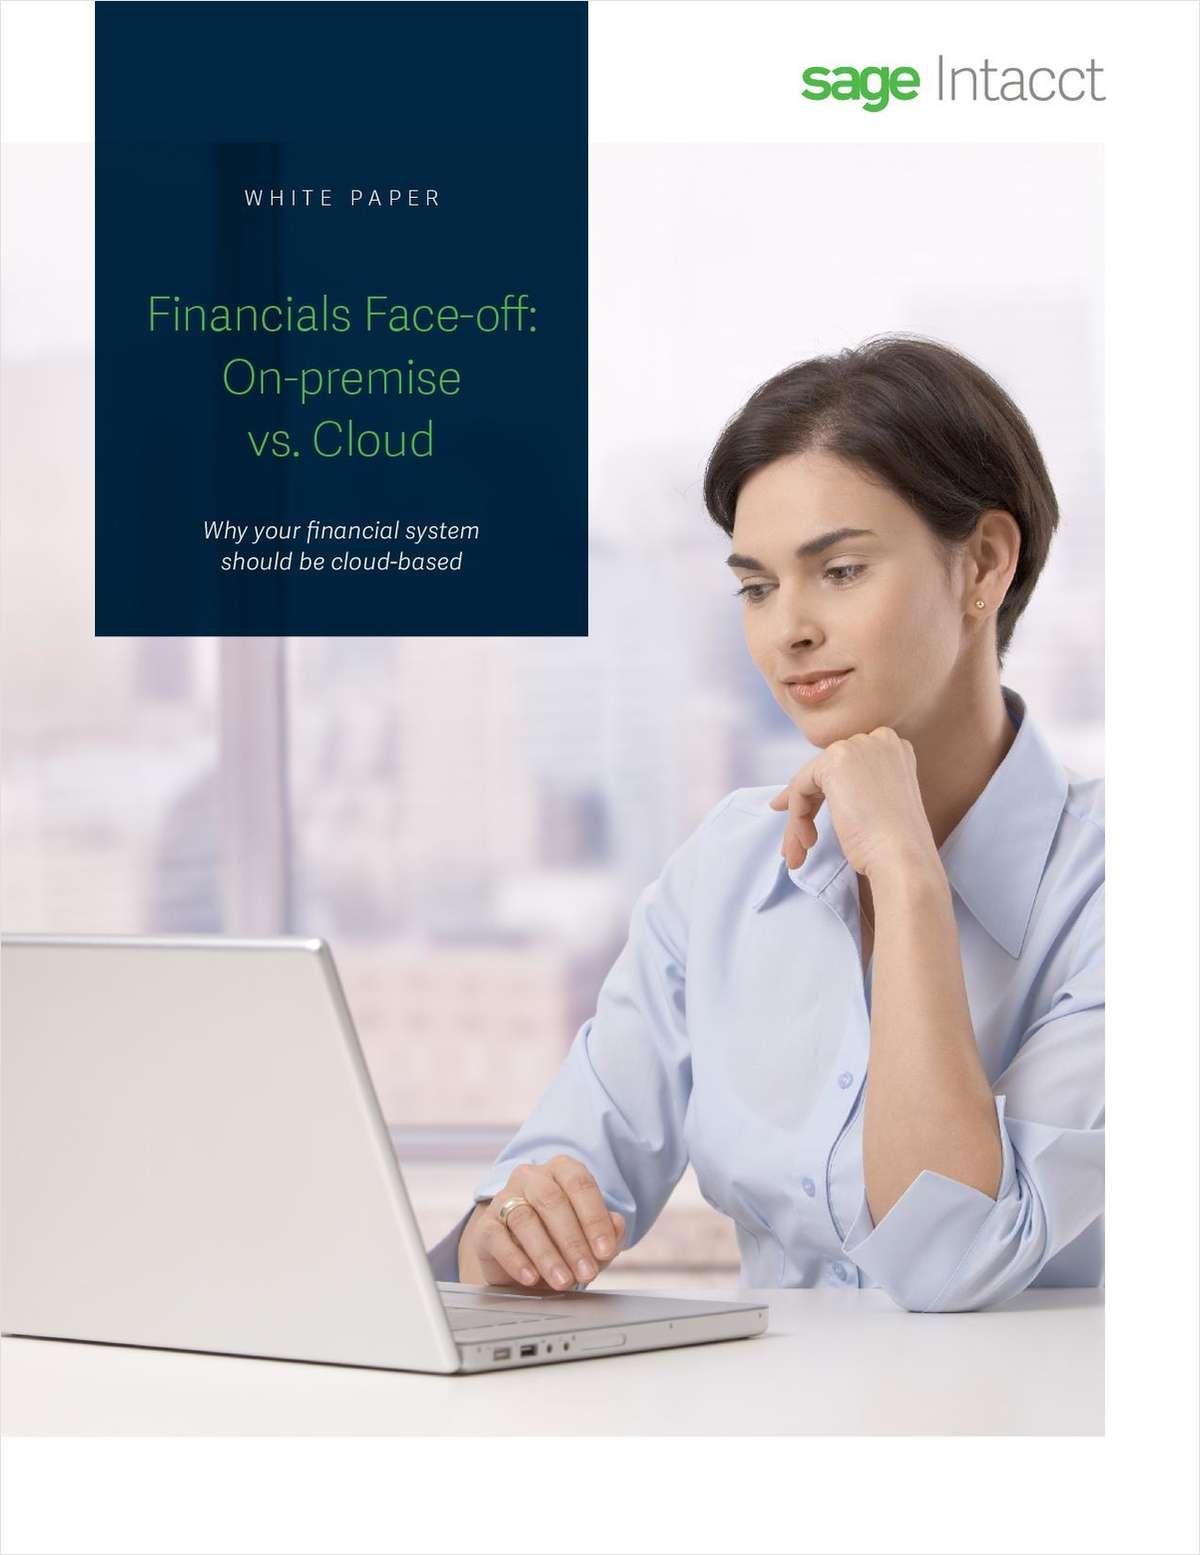 Financials Face-off: On-premise vs. Cloud